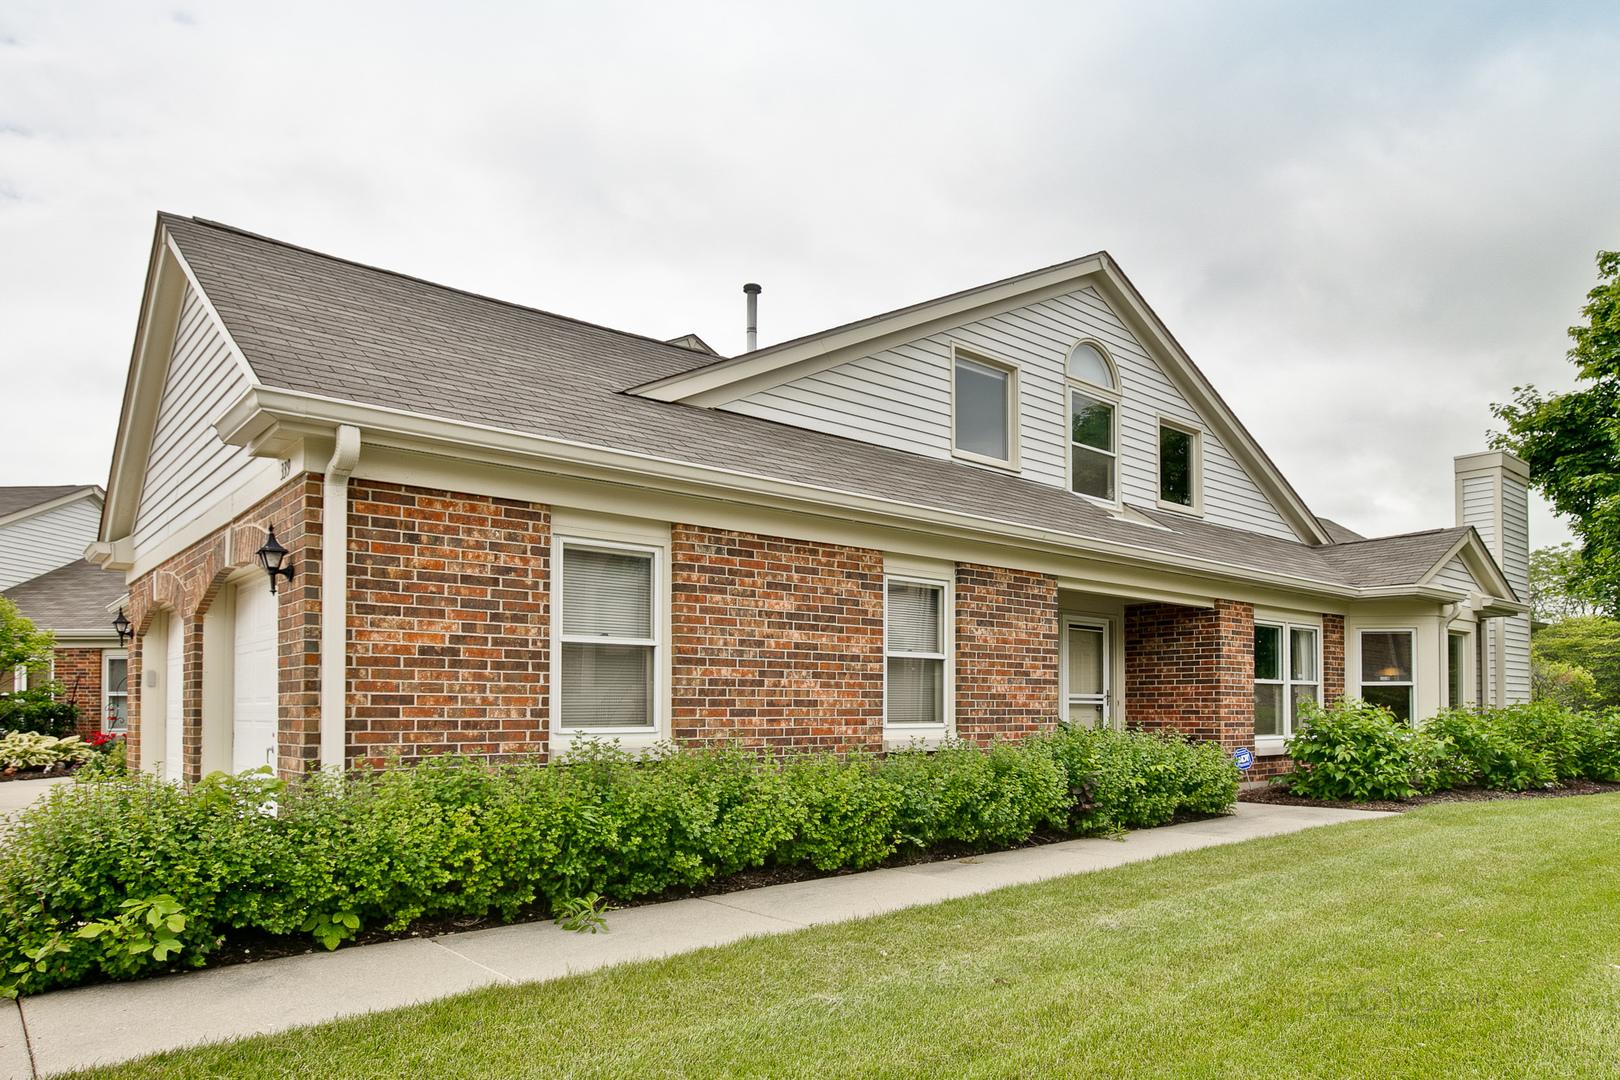 339 Satinwood ,Buffalo Grove, Illinois 60089